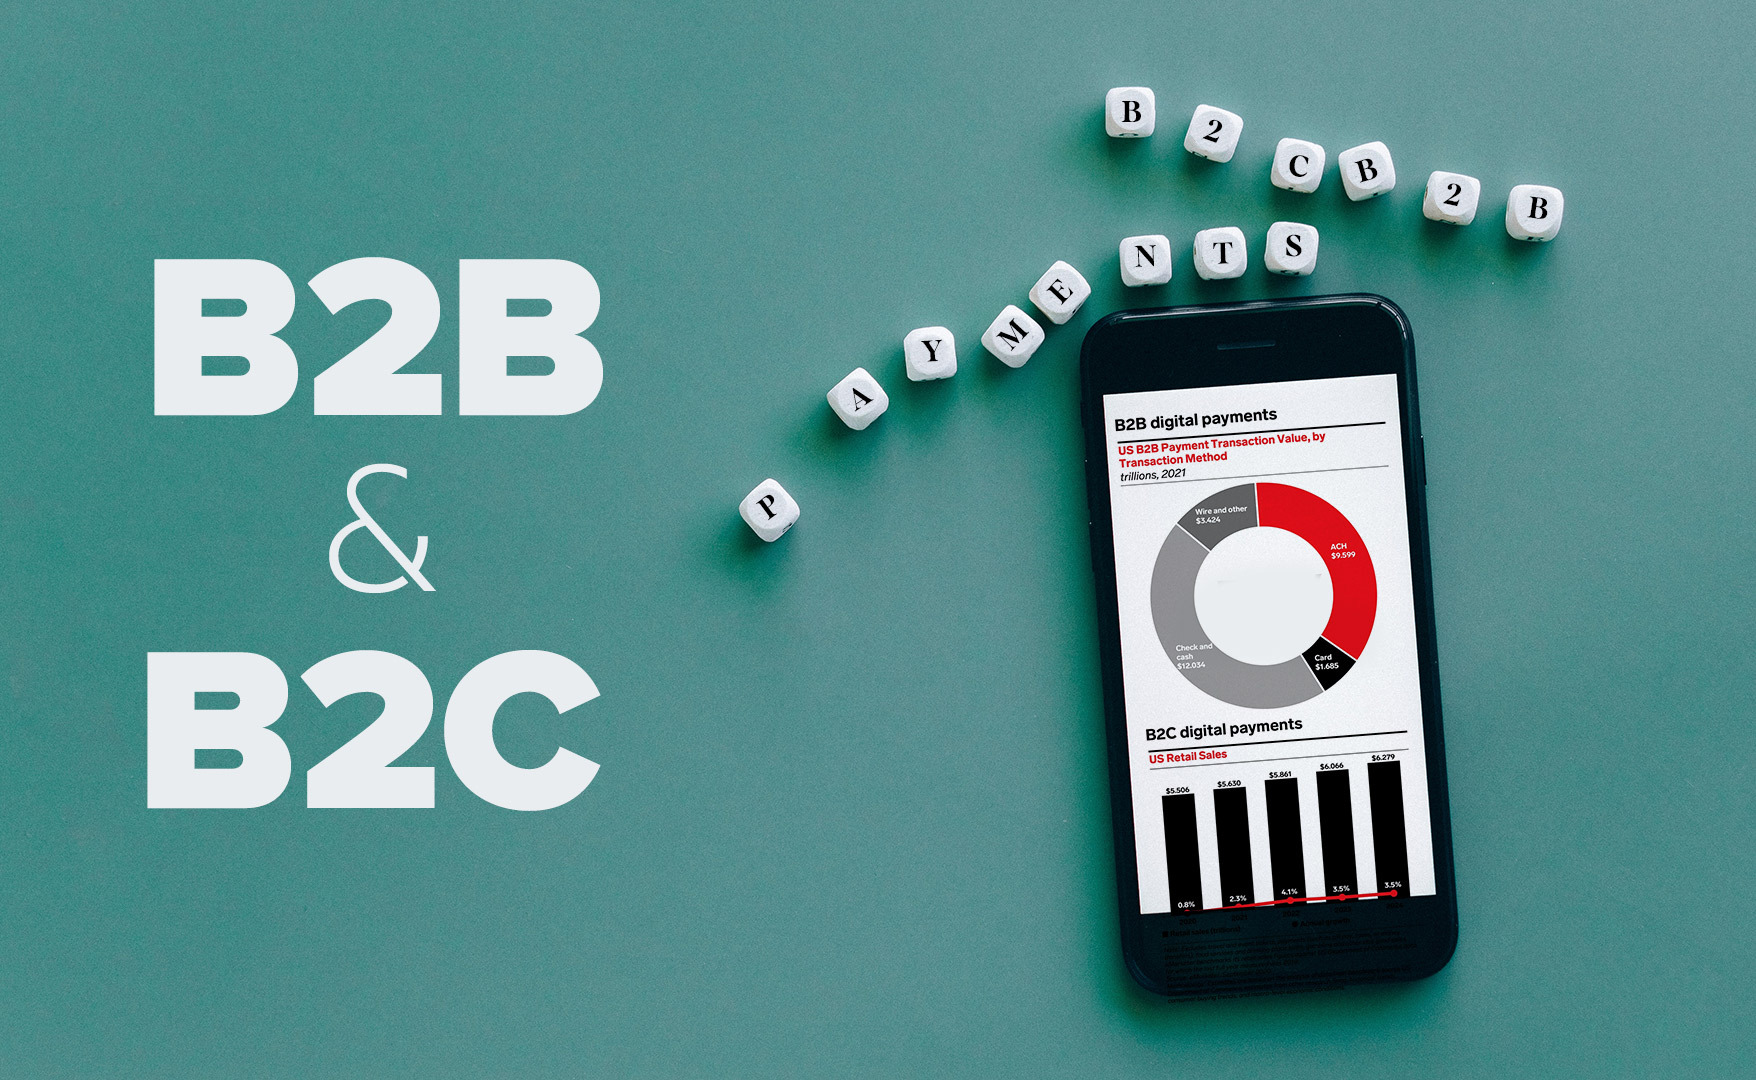 B2B Payment Trends That Follow B2C